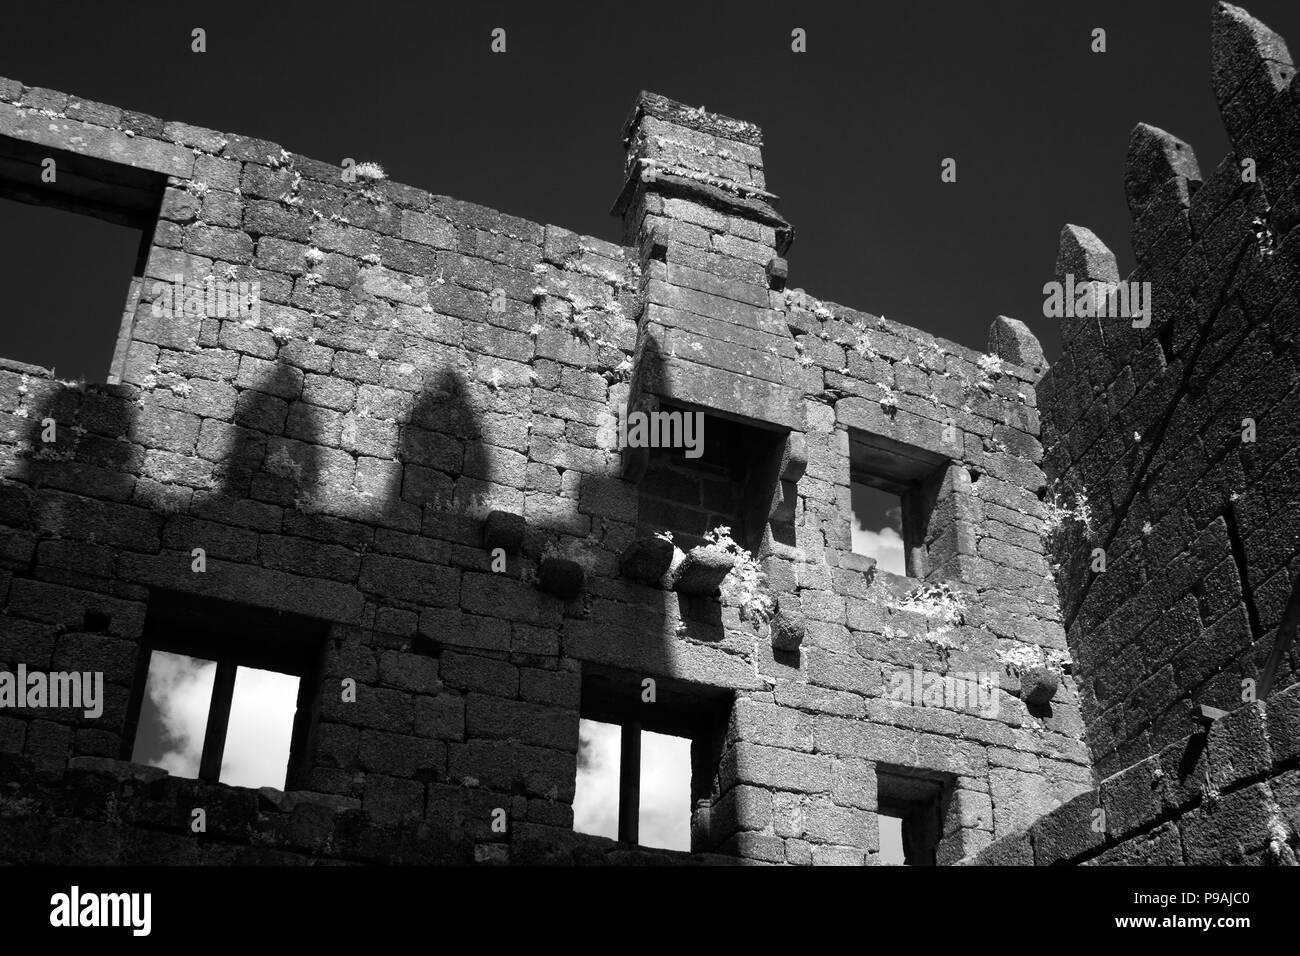 Interior of a 10th century castle. Guimaraes, north of Portugal. - Stock Image